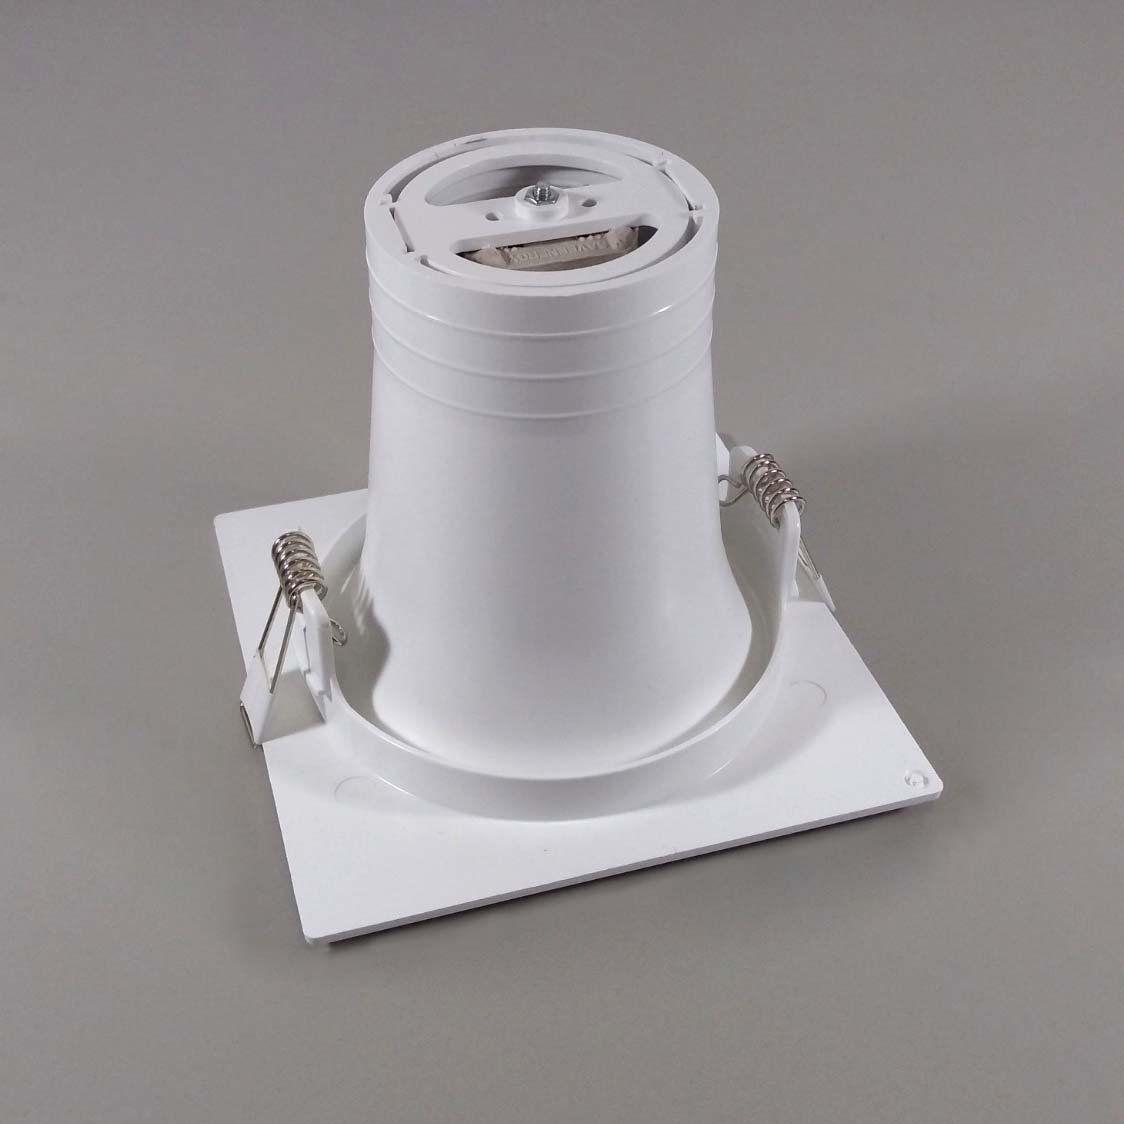 Kit 10x Spot Embutido Quadrado Bulbo Branco Save Energy